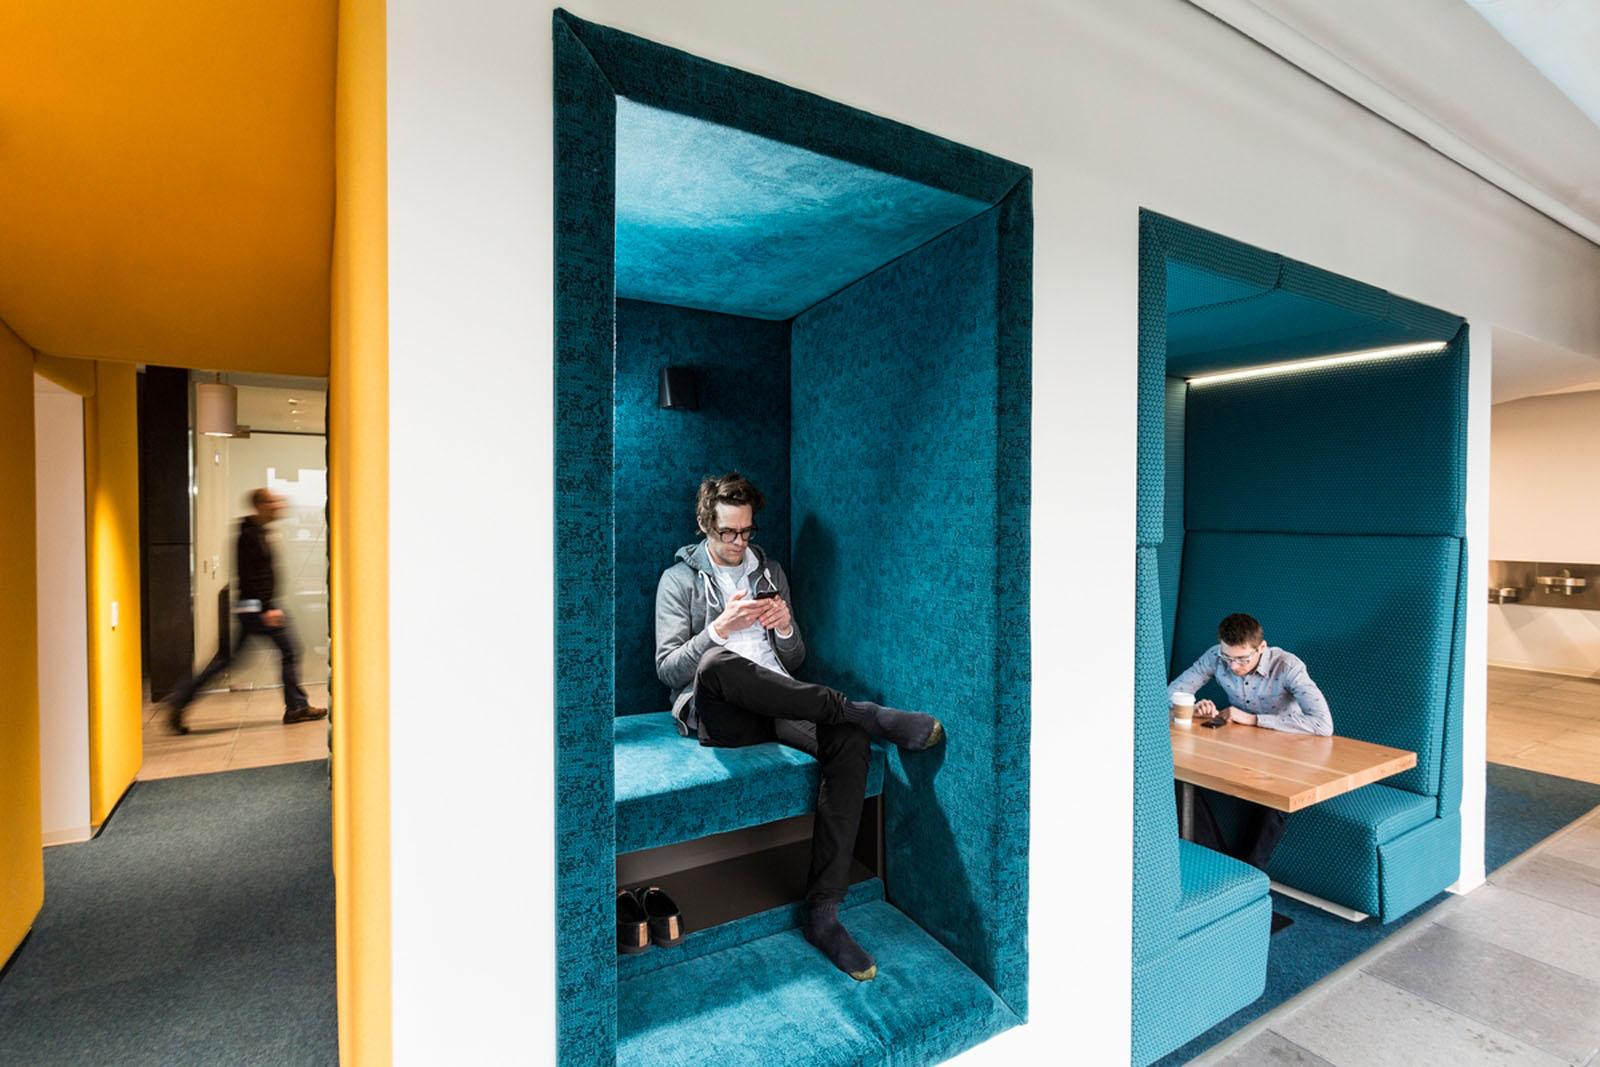 irodai pihenő fülkék